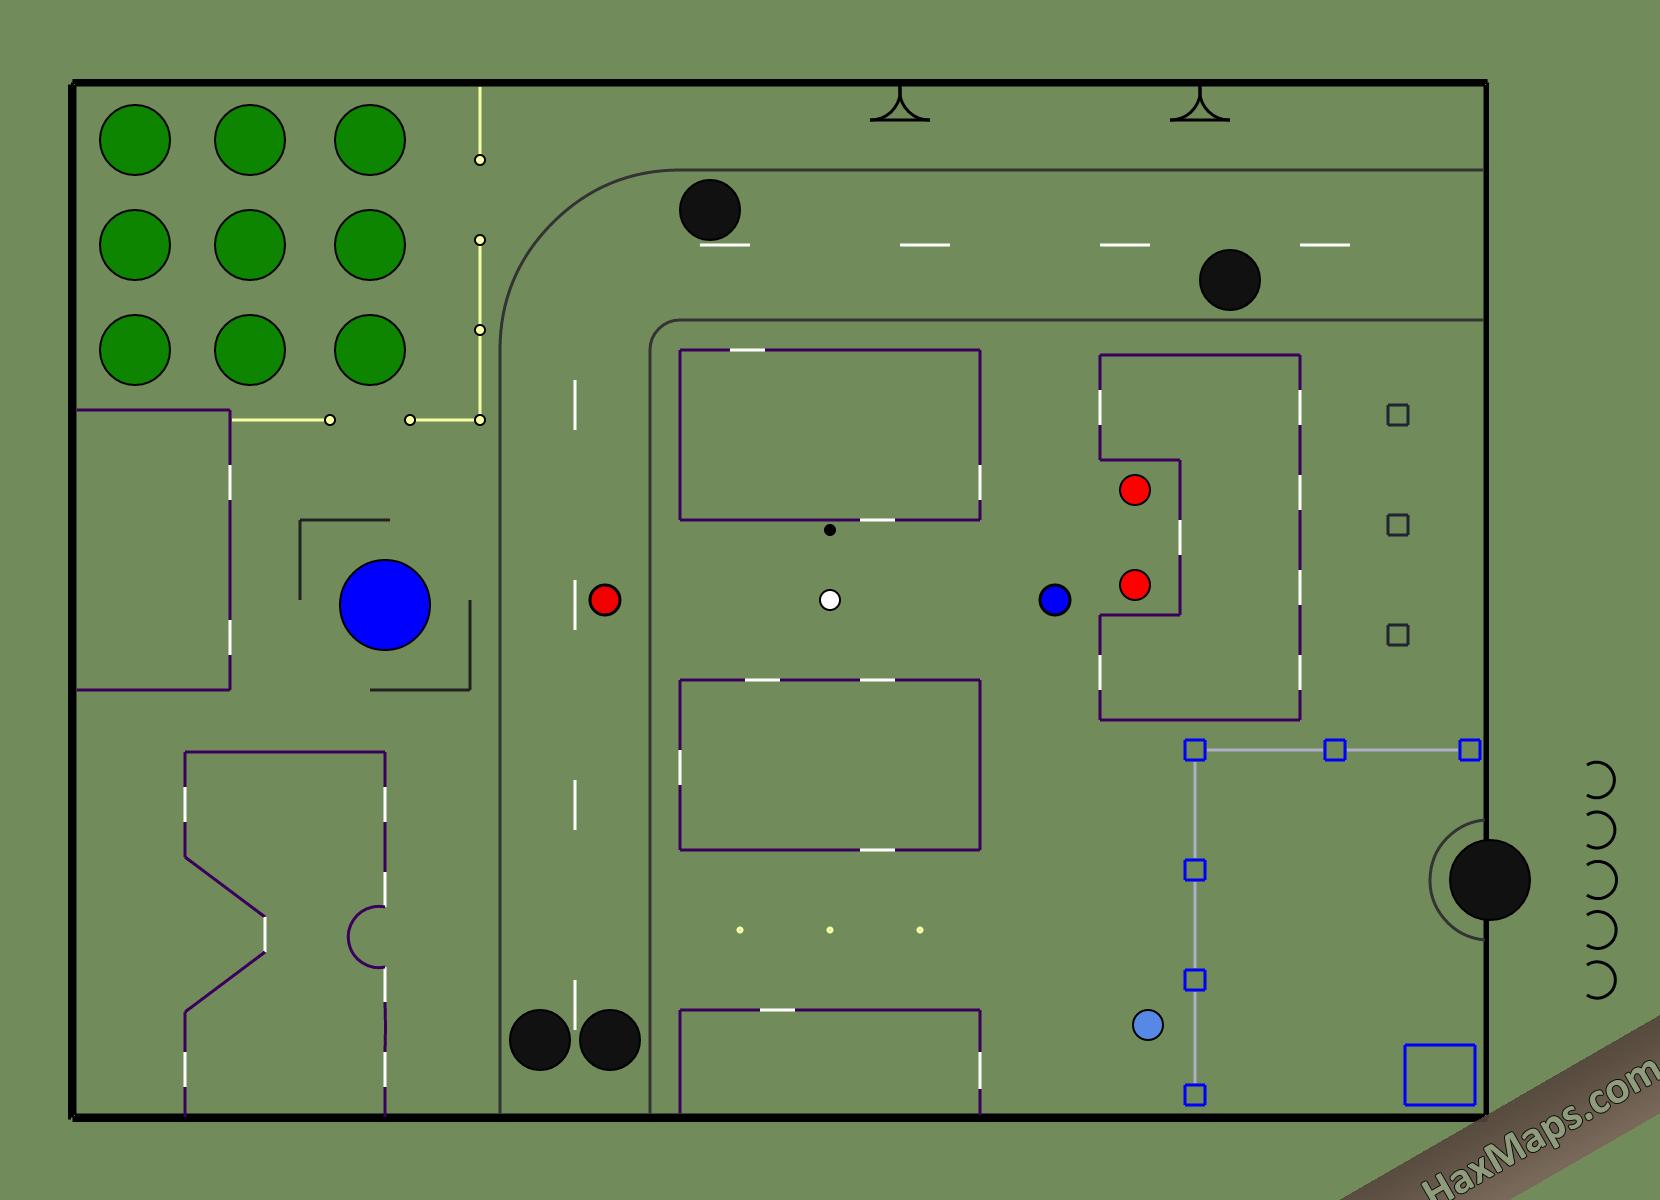 hax ball maps | Natroff Mini Training